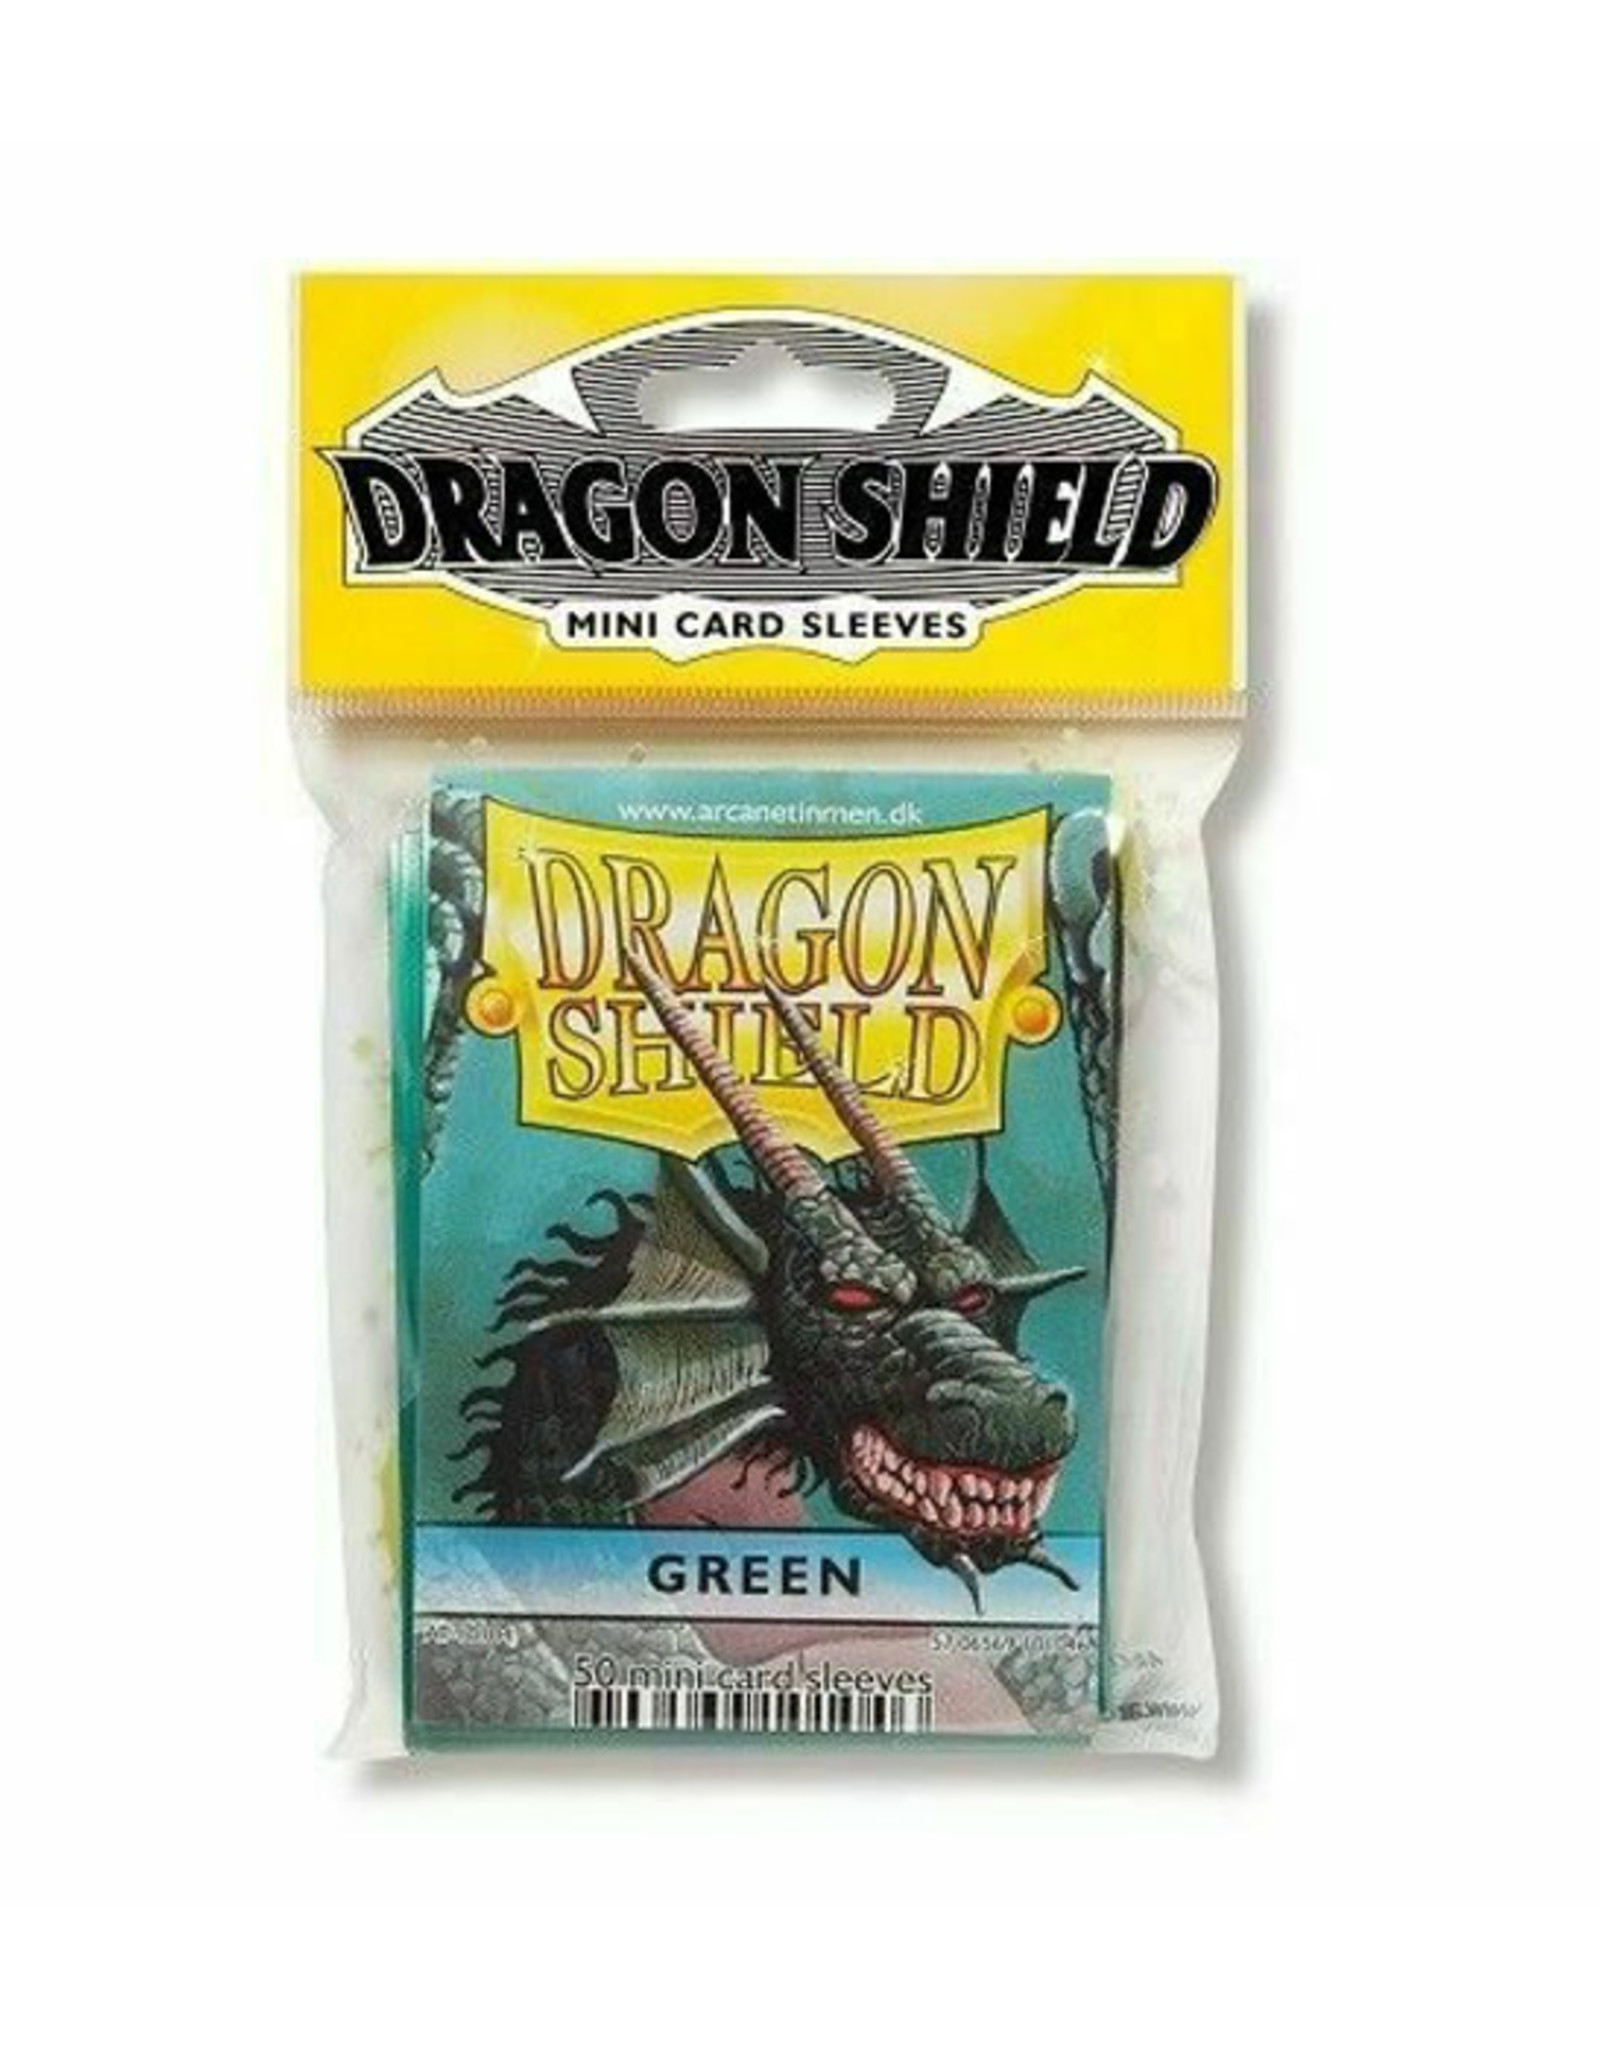 Dragon Shield Dragon Shield: Sleeves - Small - Classic - Green (50)